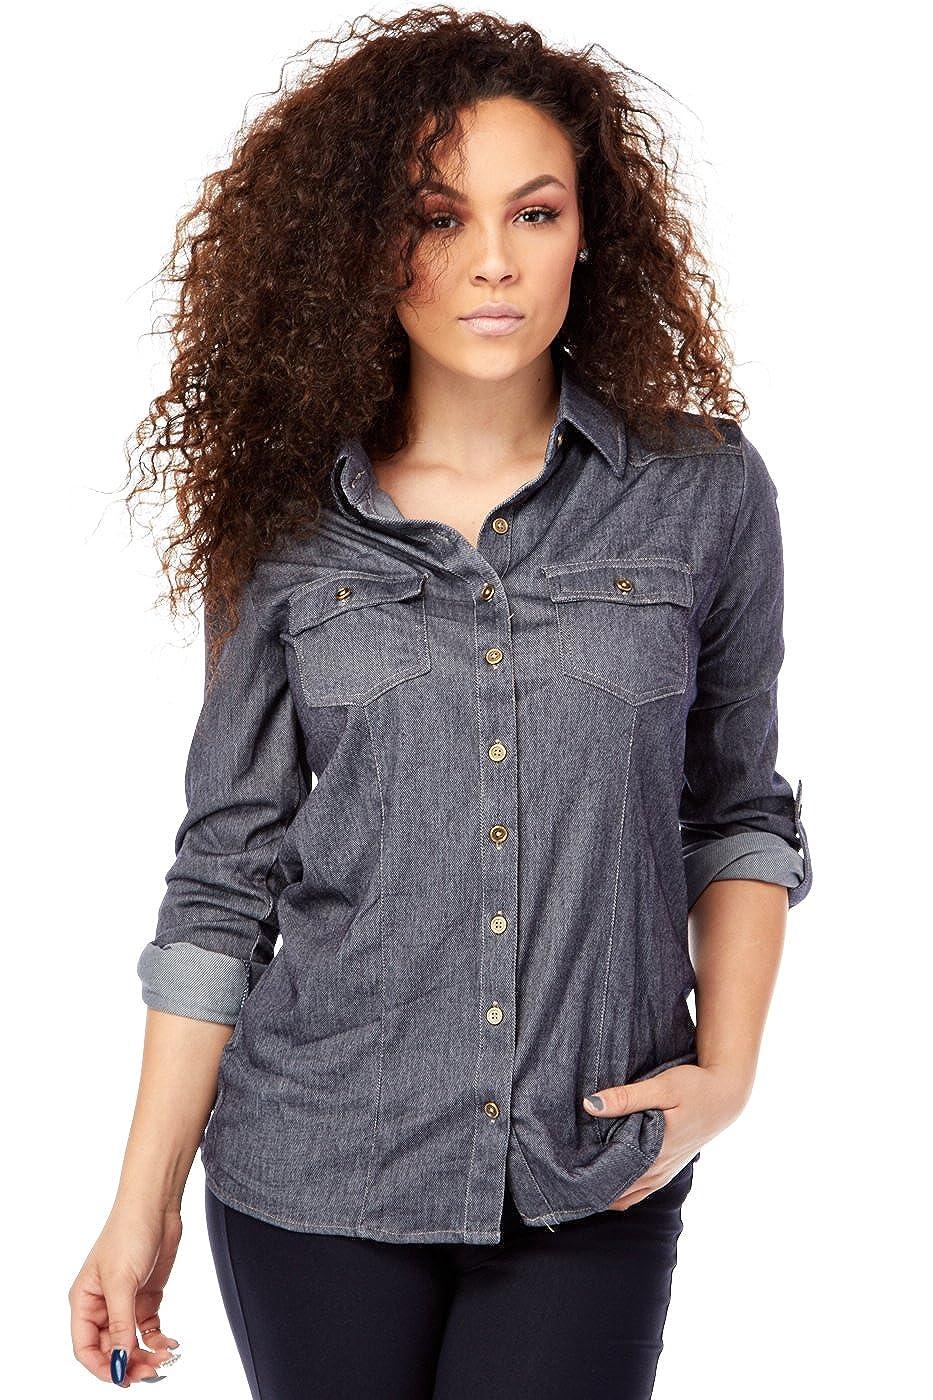 Womens Collared Rayon Denim Button Down Shirts B3844 At Amazon